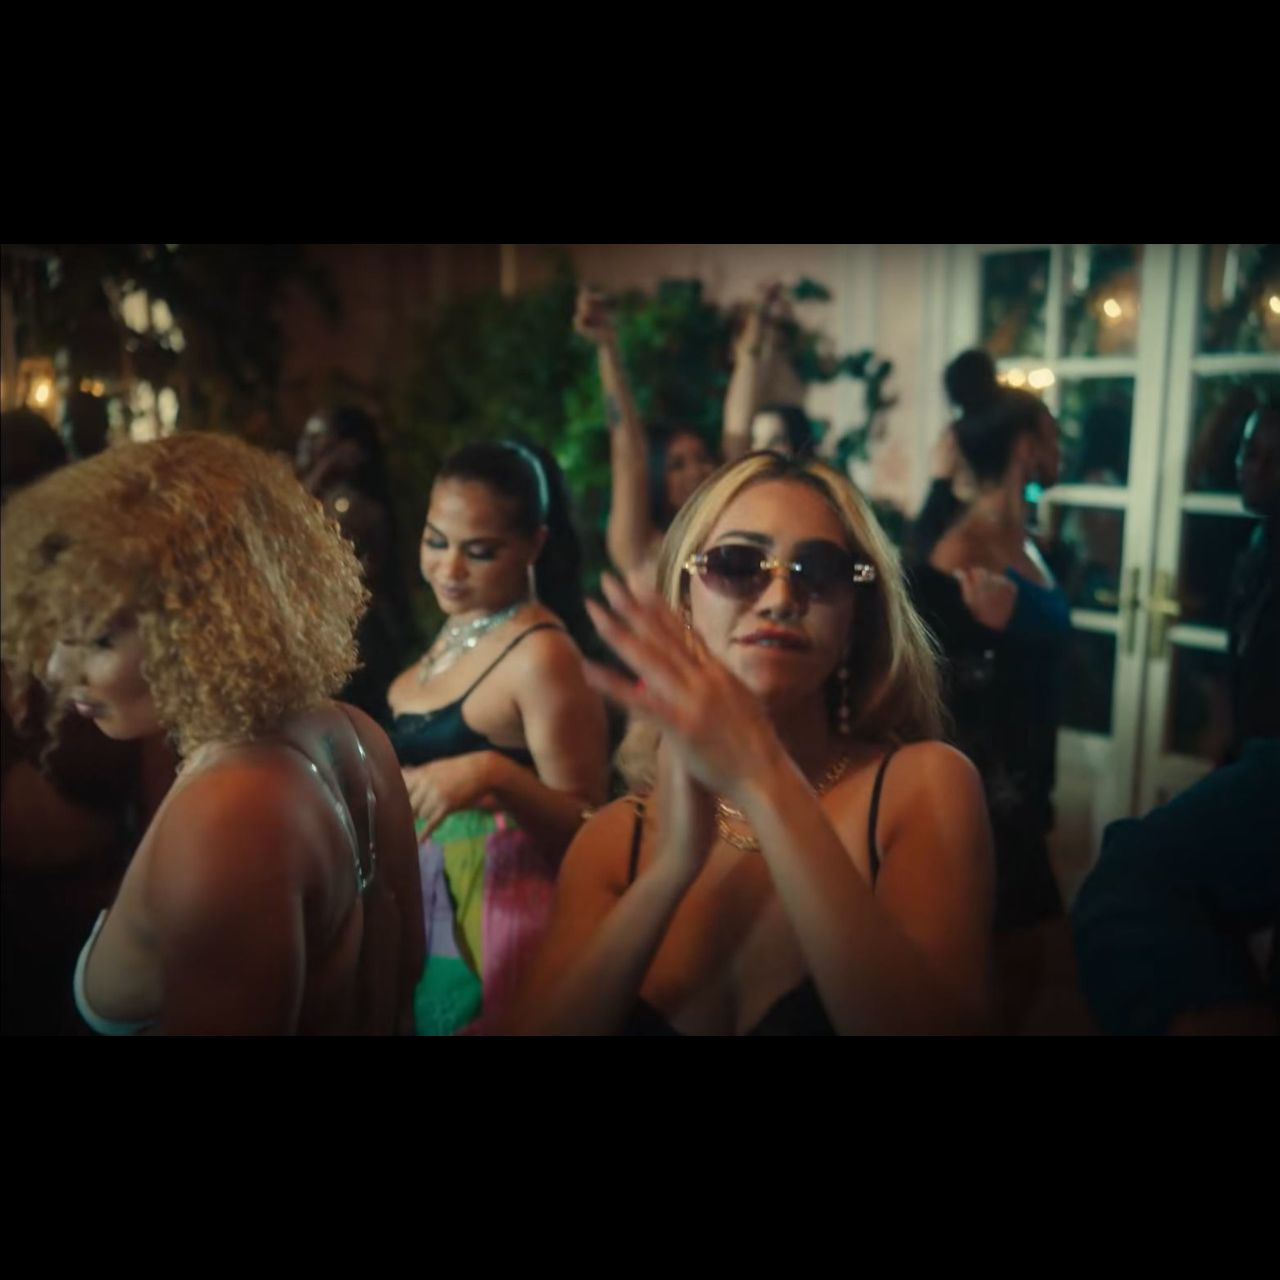 Rvssian - Nostálgico (ft. Rauw Alejandro and Chris Brown) (Thumbnail)